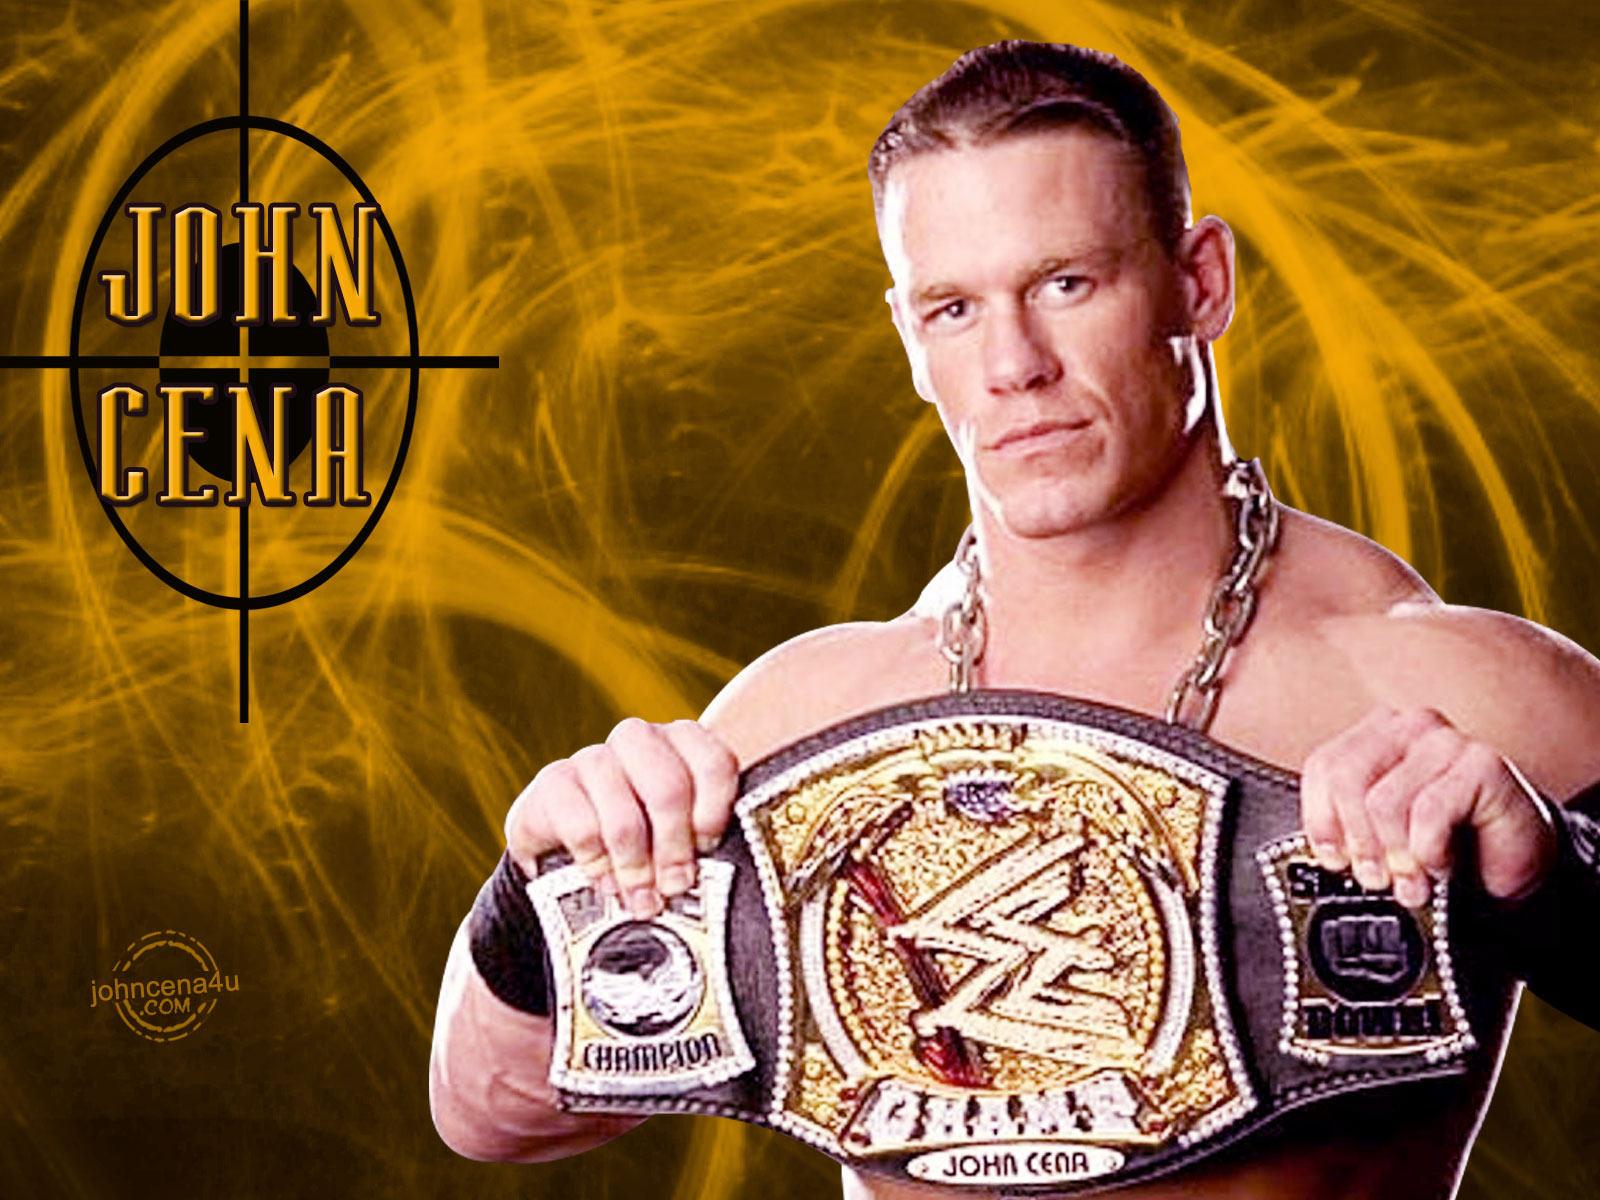 Cena Hd Wallpaper John Cena Wwe Wallpapers Hd The Nology